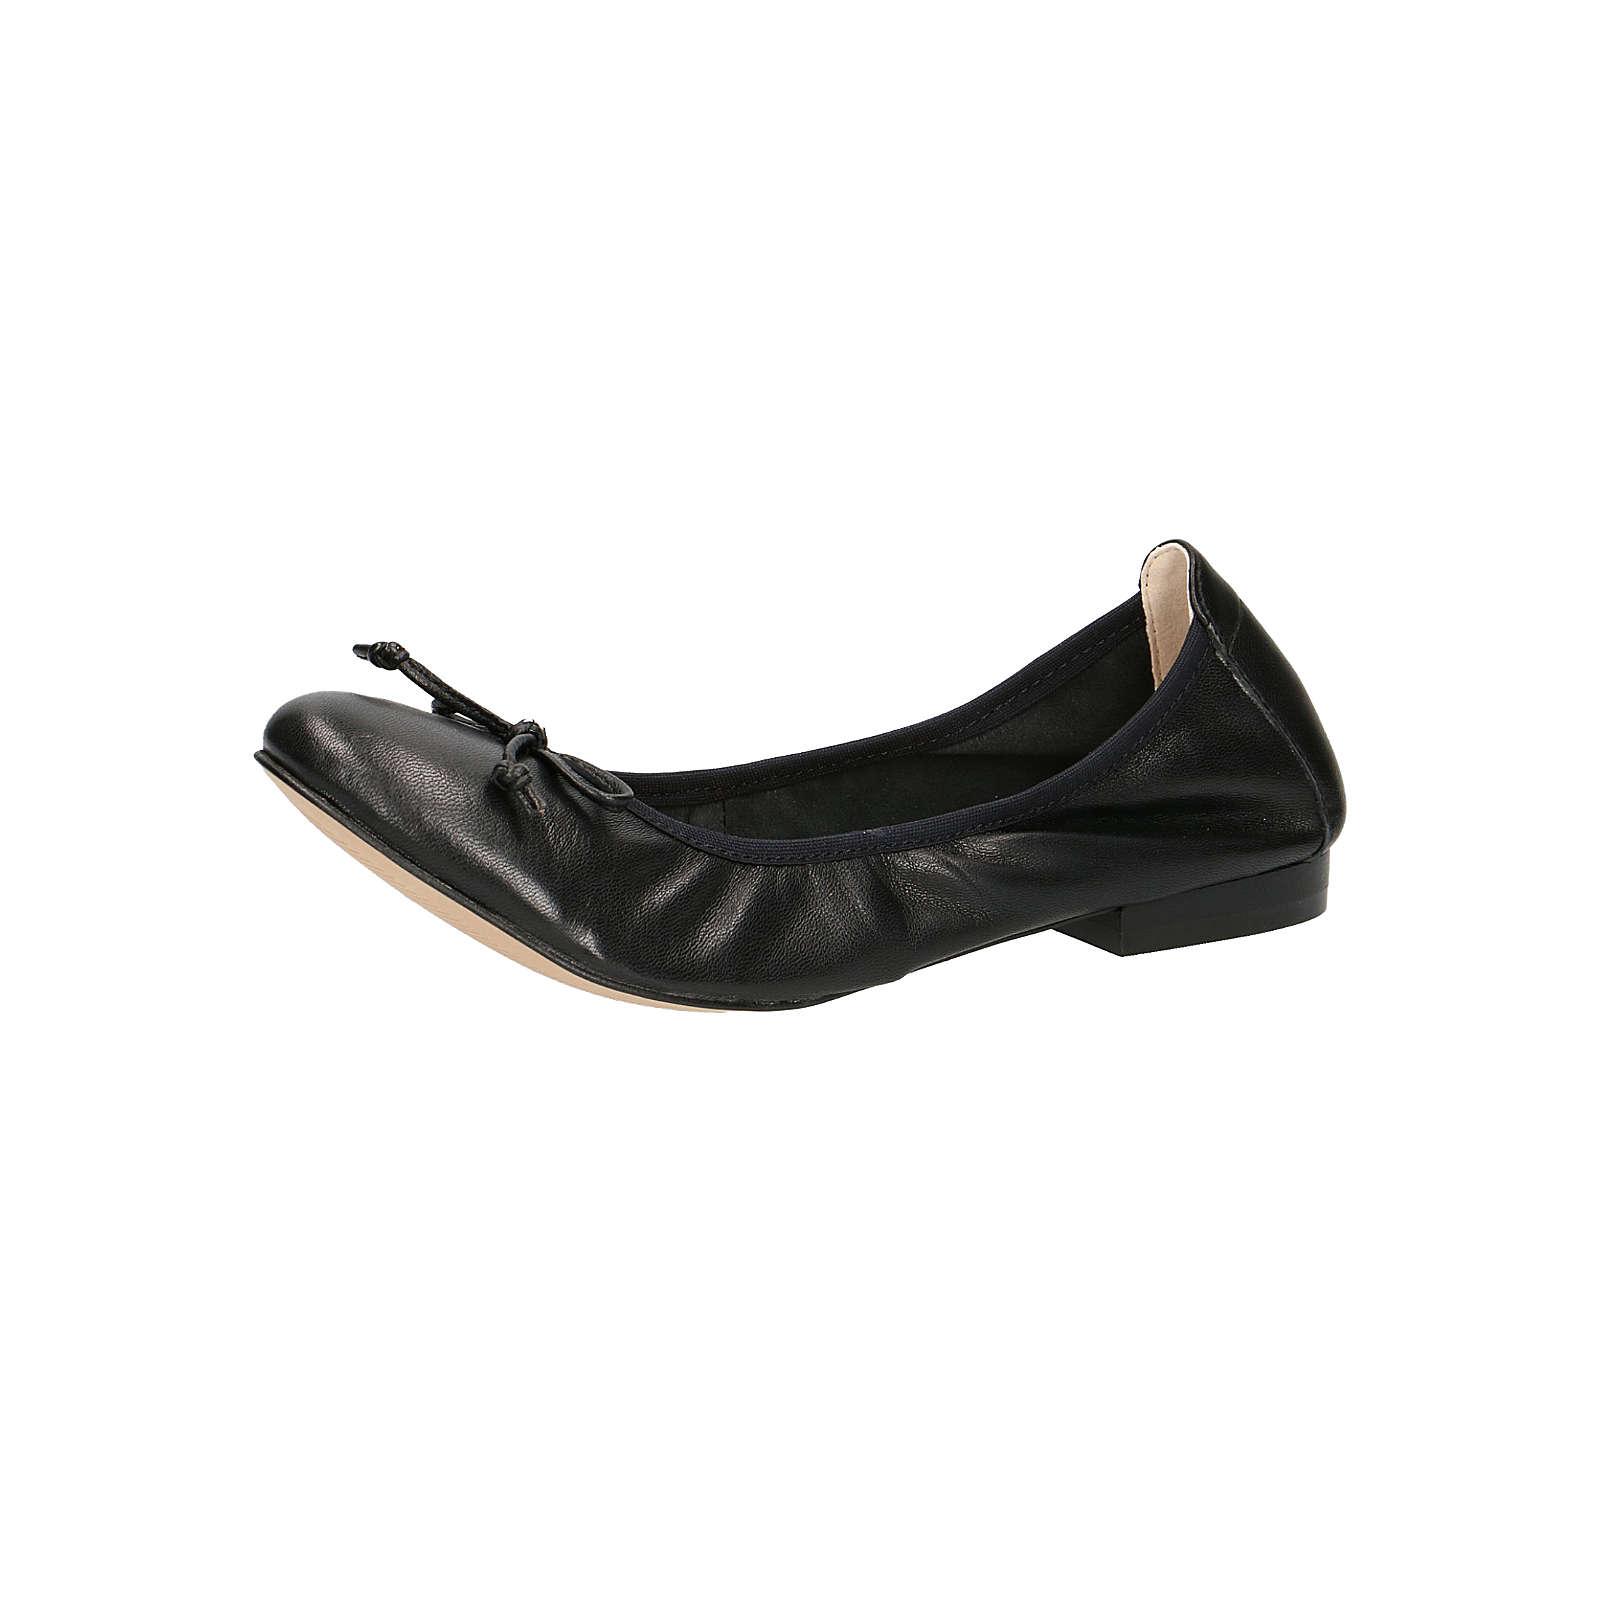 CAPRICE 9-22102-22 022 Damen Ballerina Leder Black Schwarz Klassische Ballerinas schwarz Damen Gr. 39